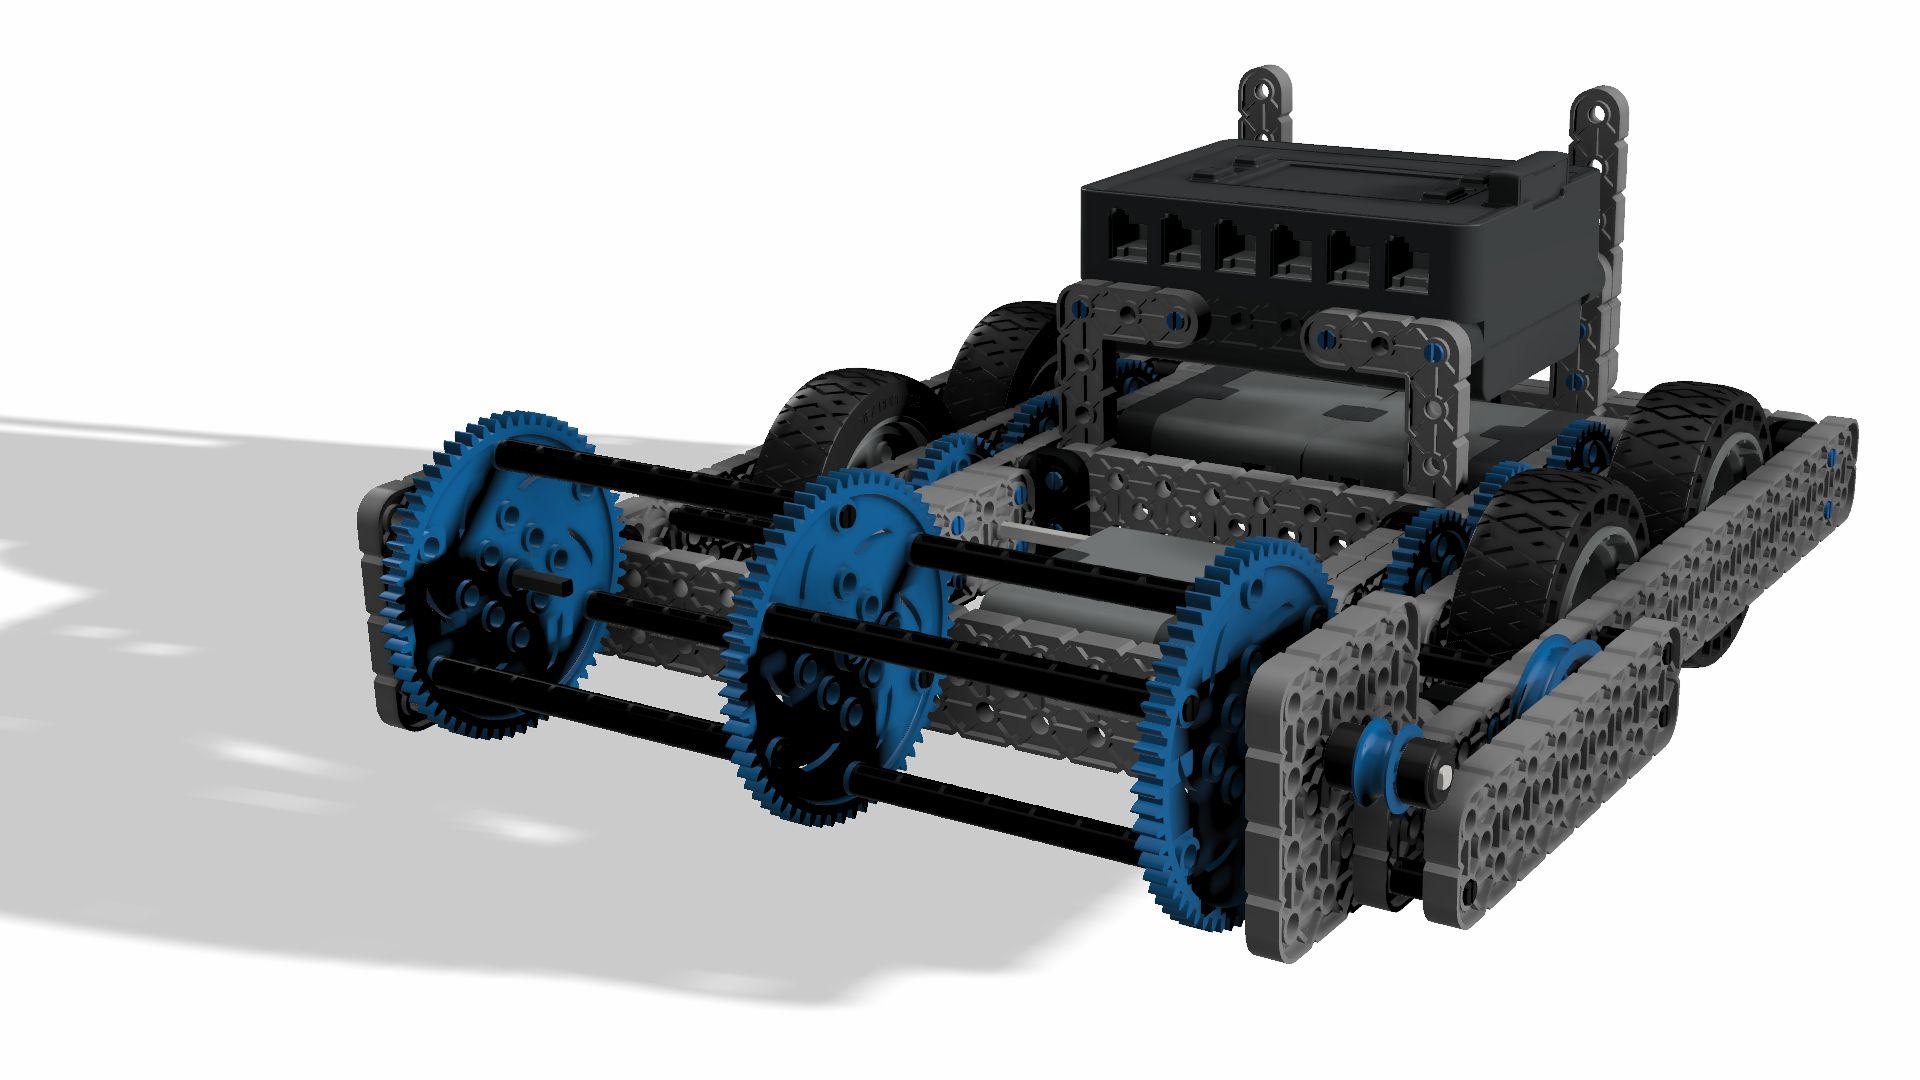 Standard-drive-base-2-v11-v2111111-3500-3500